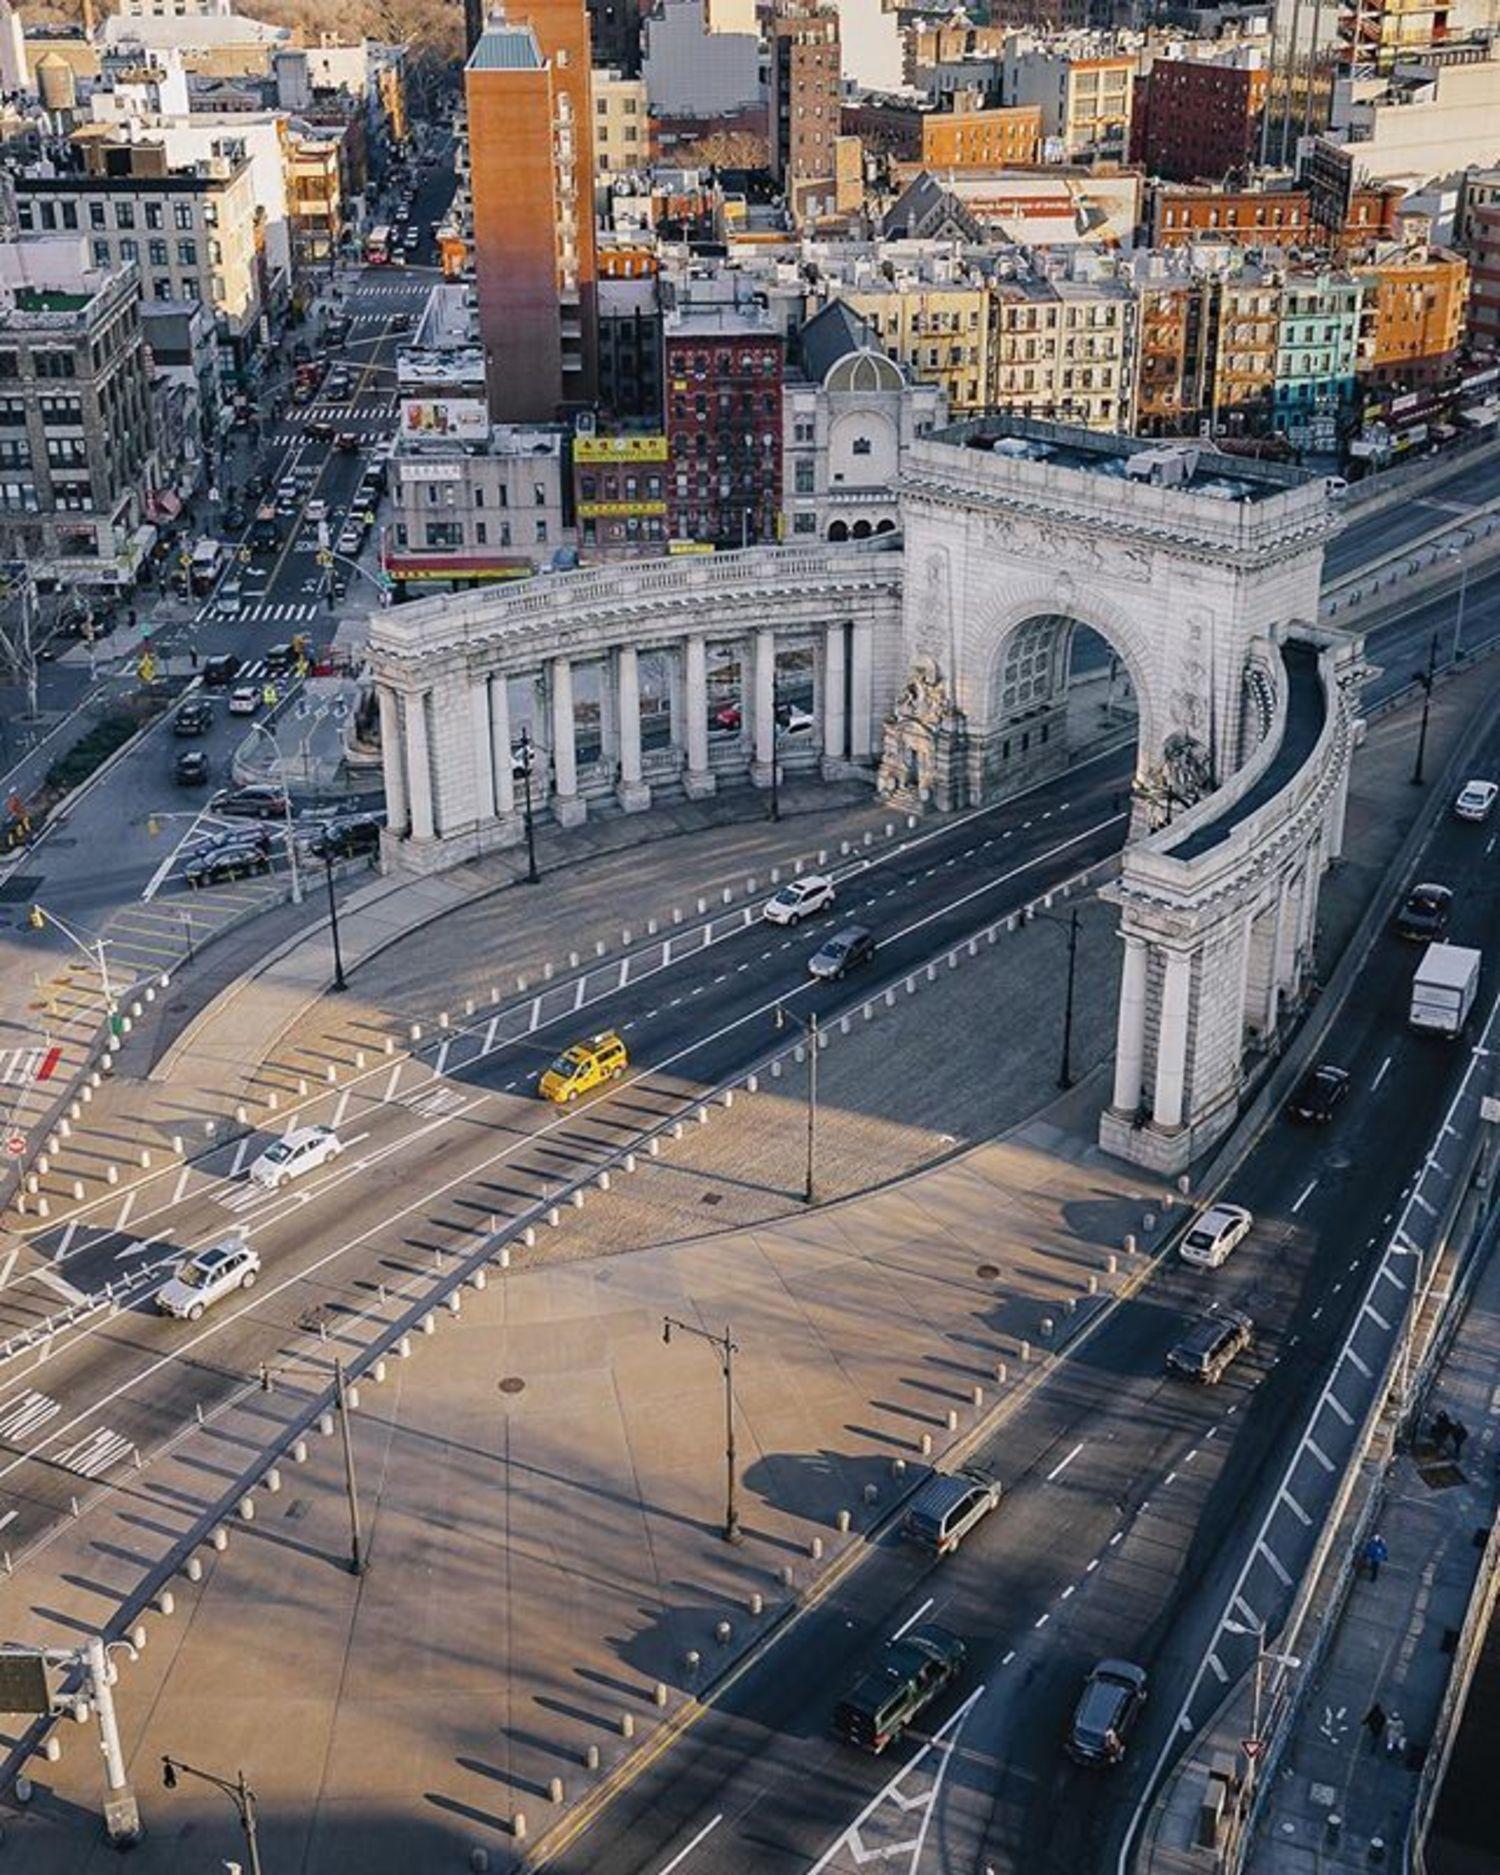 Manhattan Bridge, New York, New York. Photo via @ceos_downbeat #viewingnyc #newyorkcity #newyork #nyc #manhattanbridge